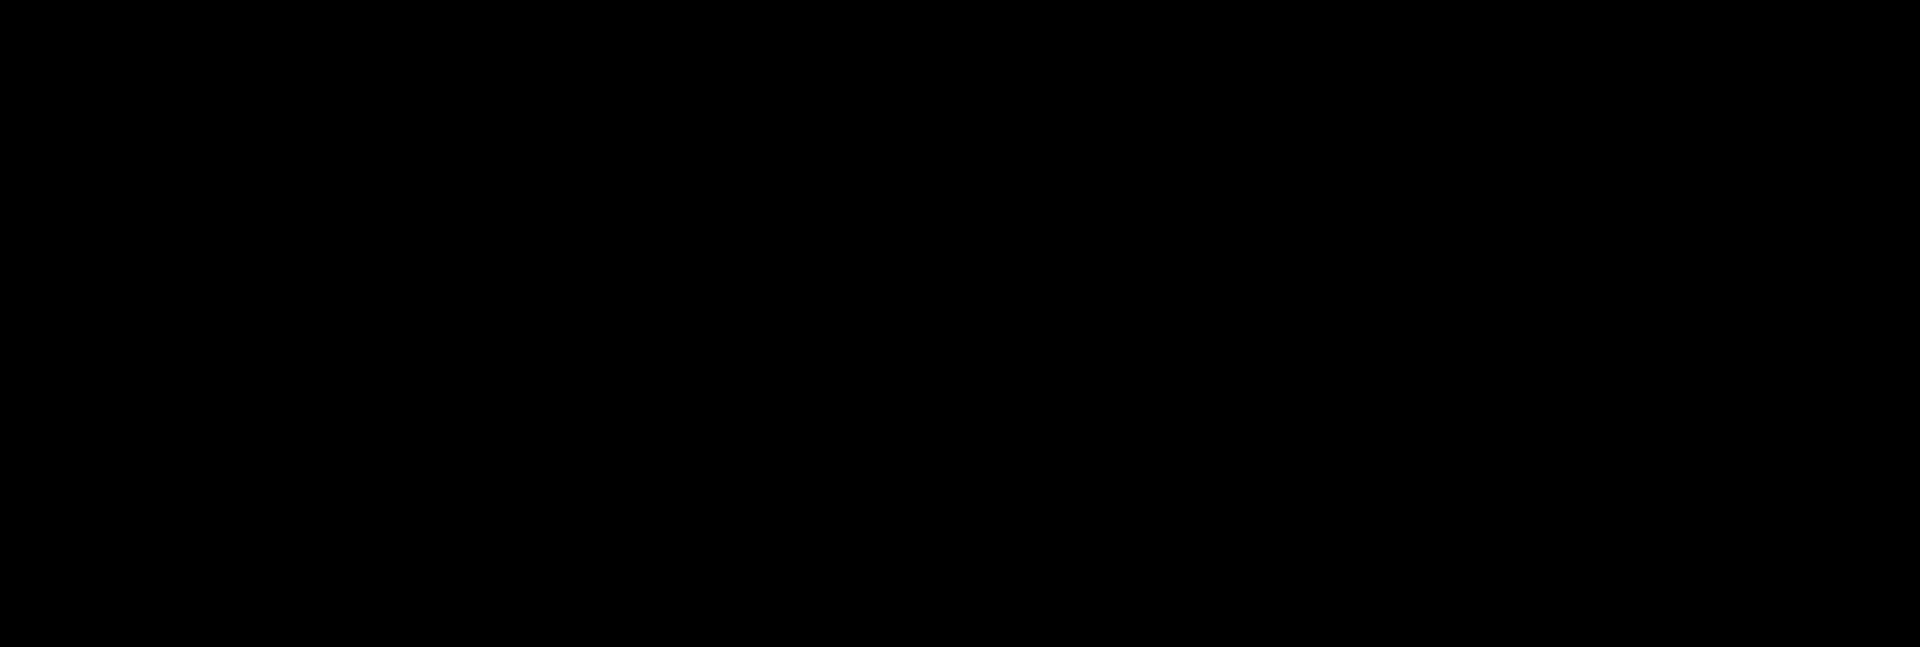 lavkarbo-karbonader-hovedbilde